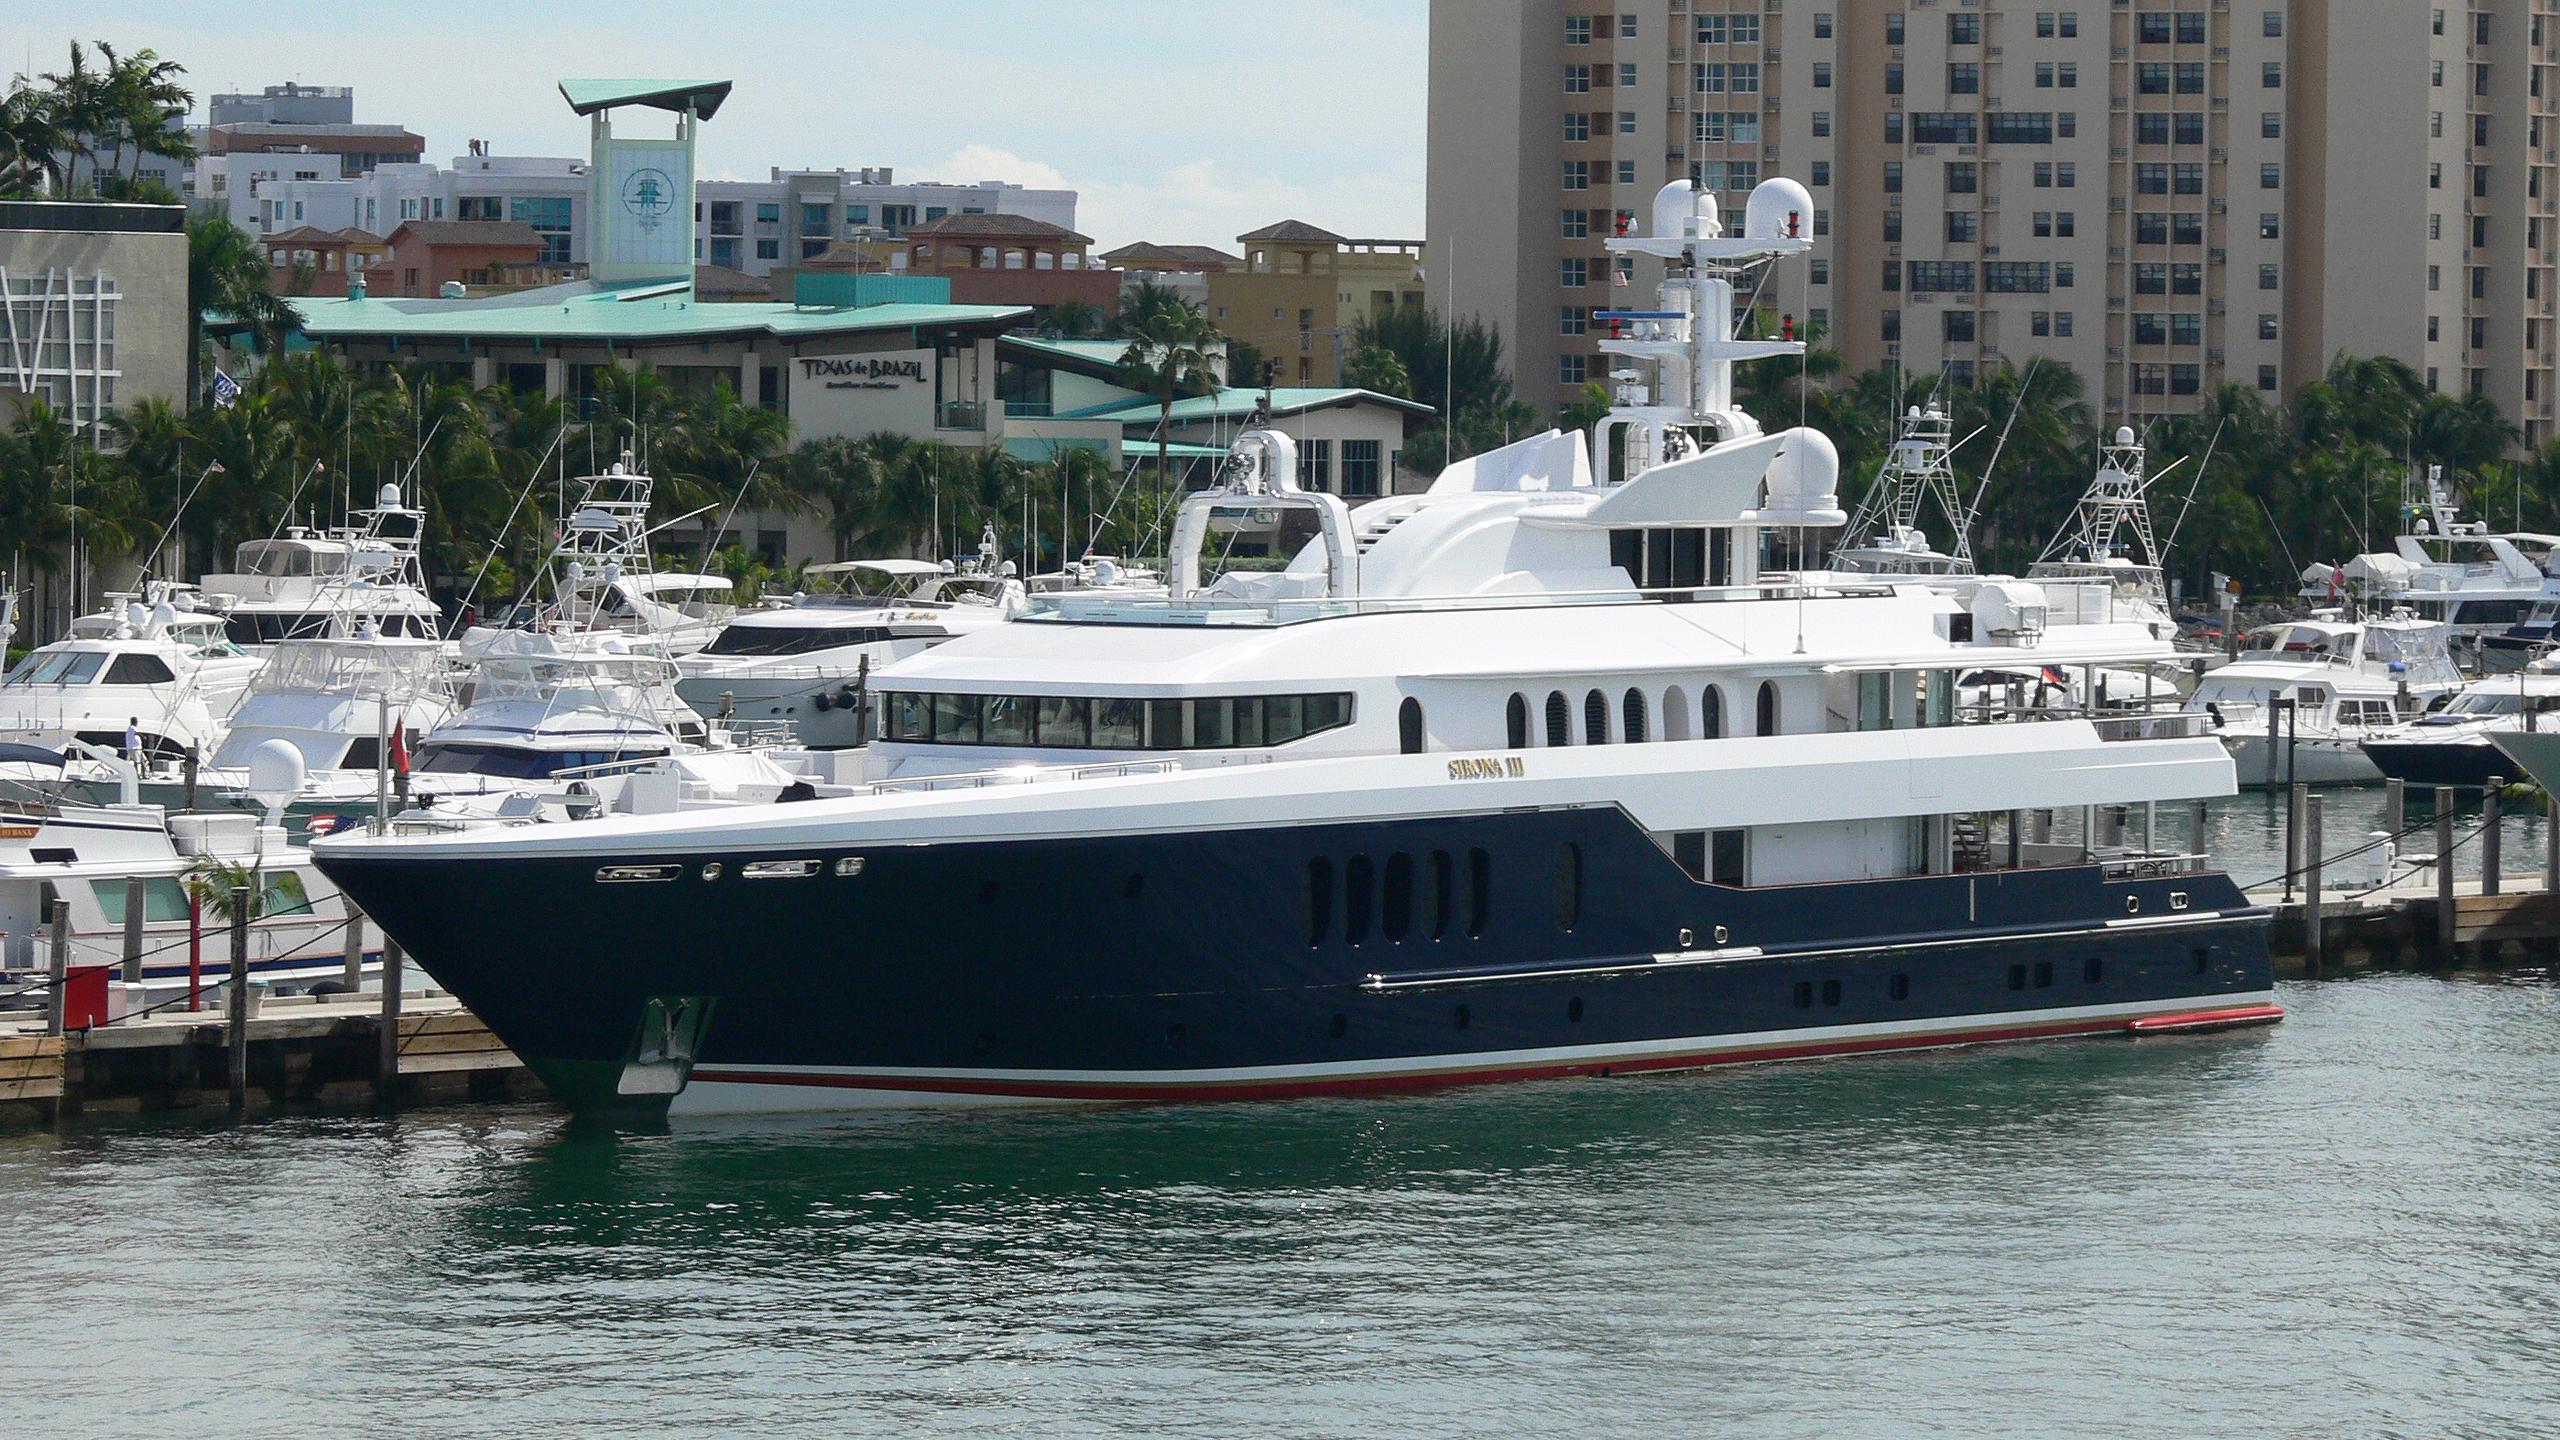 sirona-iii-motor-yacht-oceanfast-2004-56m-half-profile